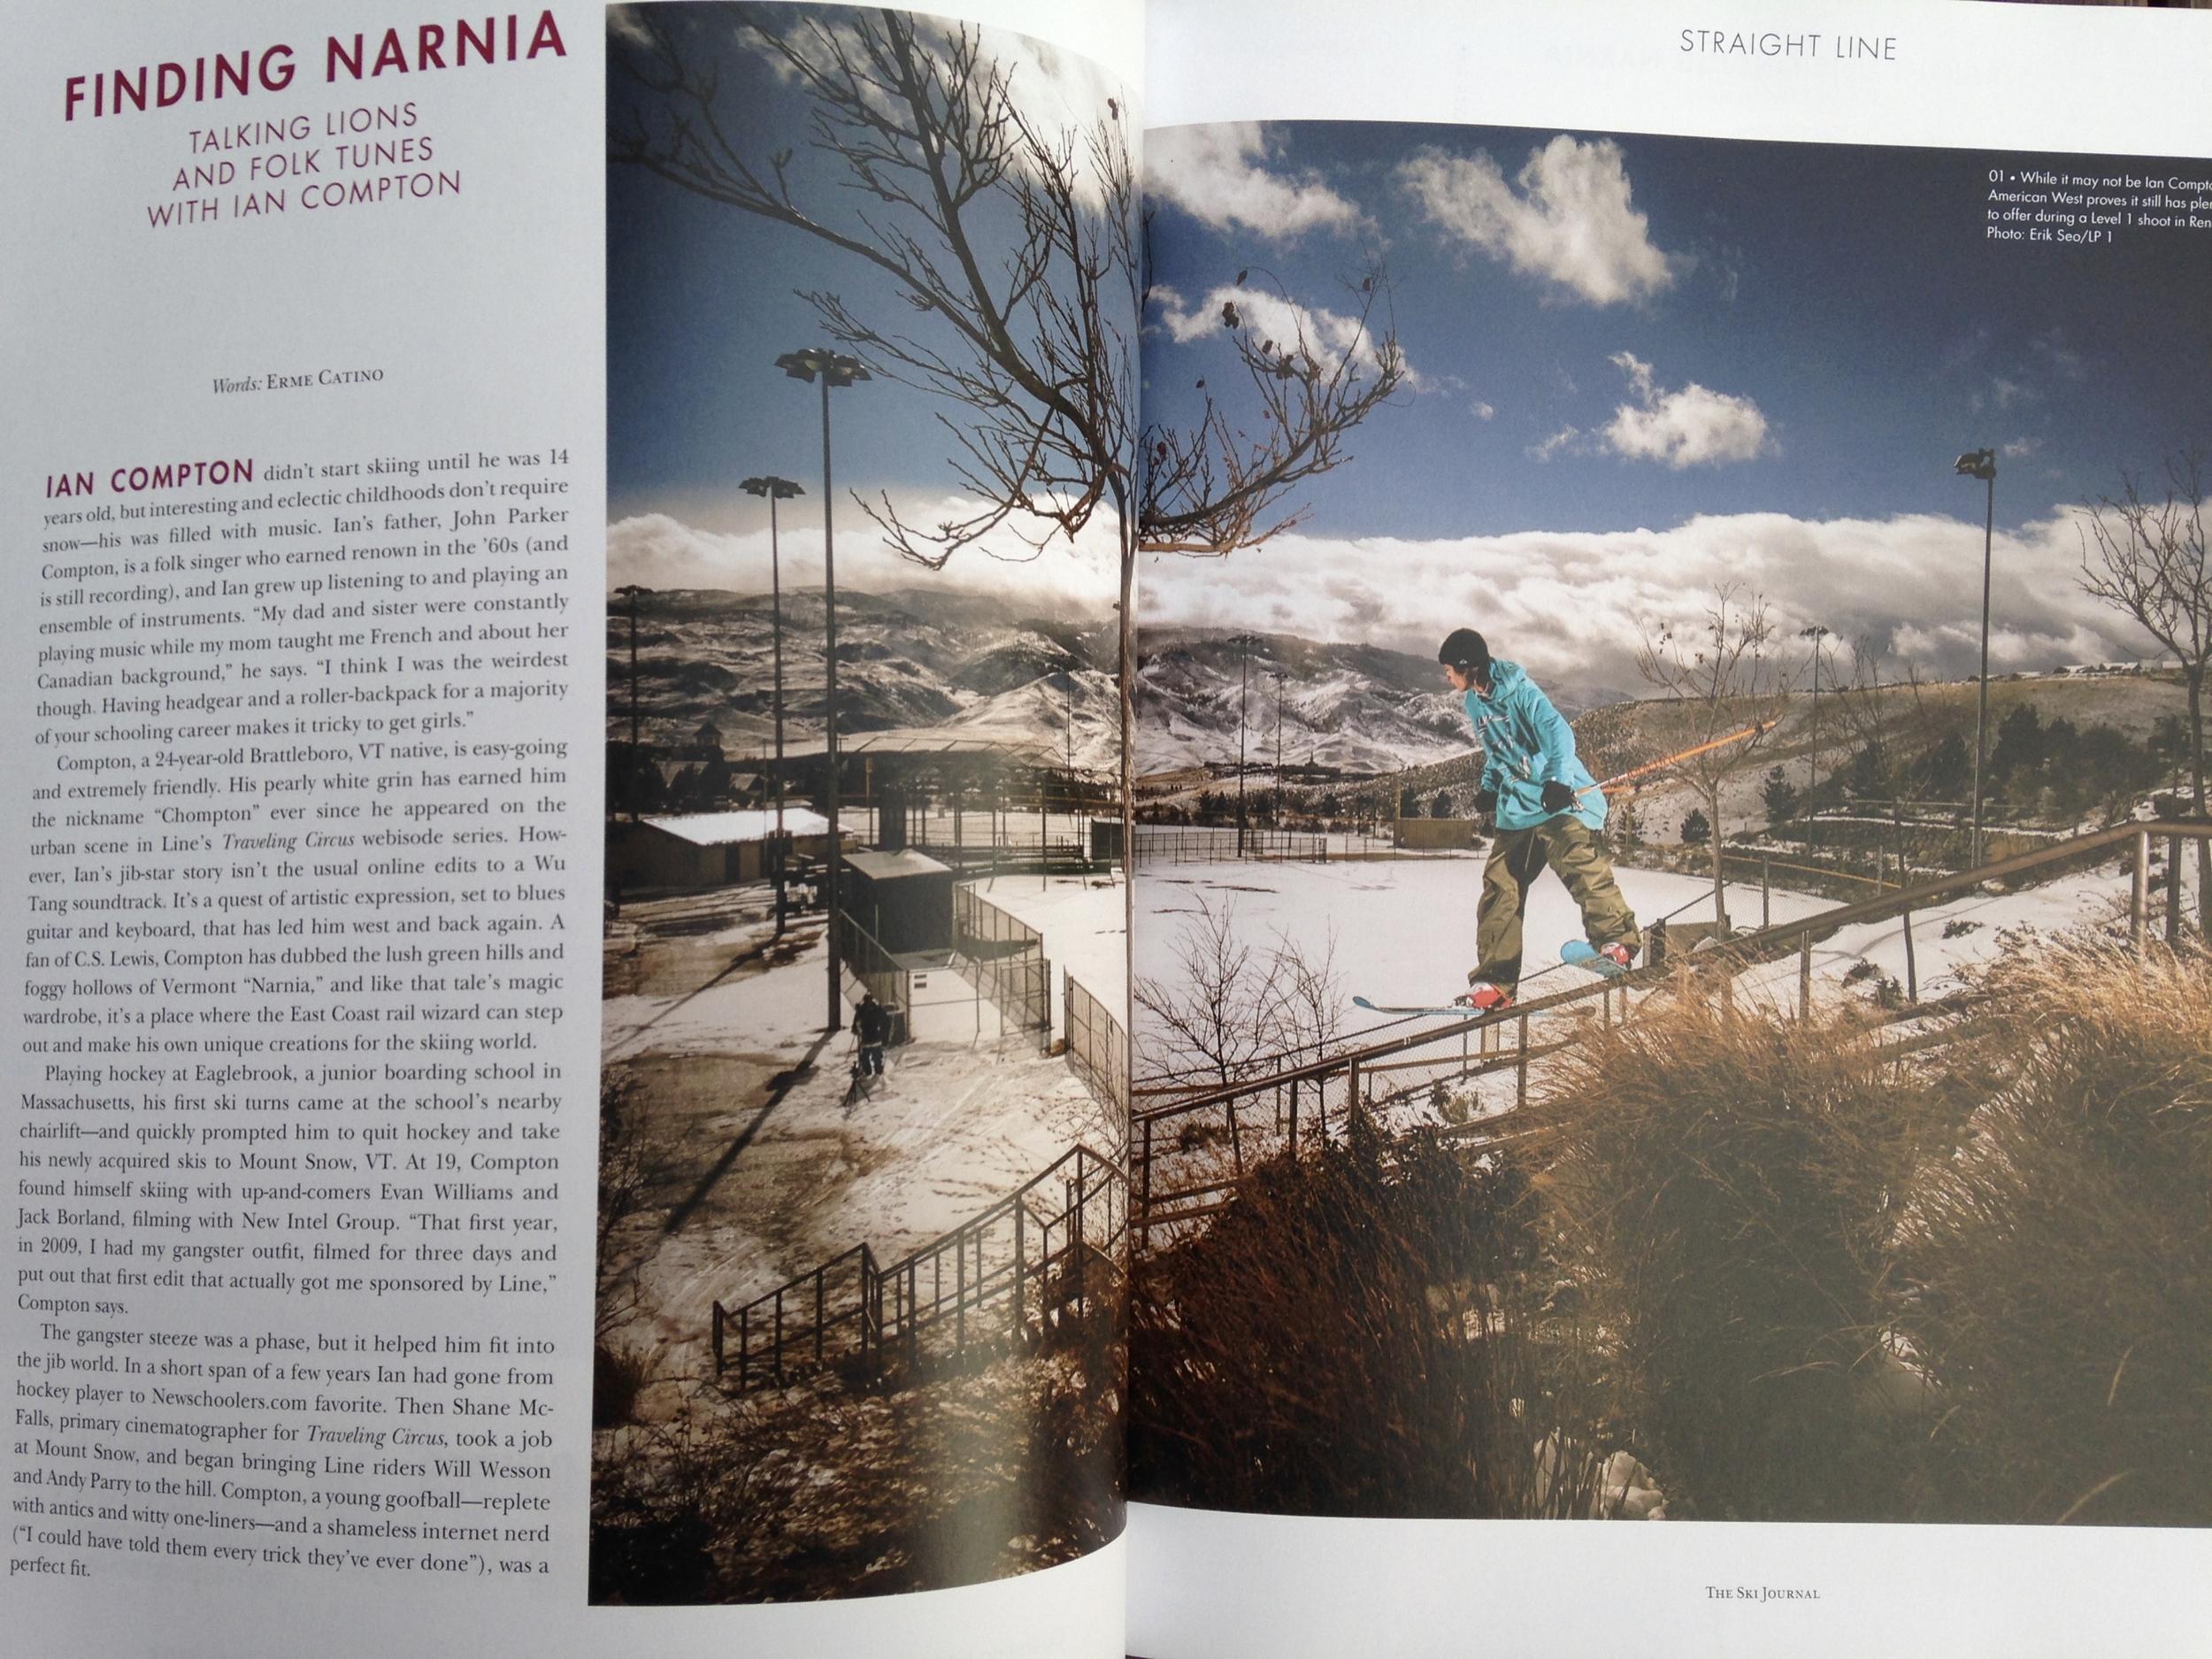 Finding Narnia.jpg